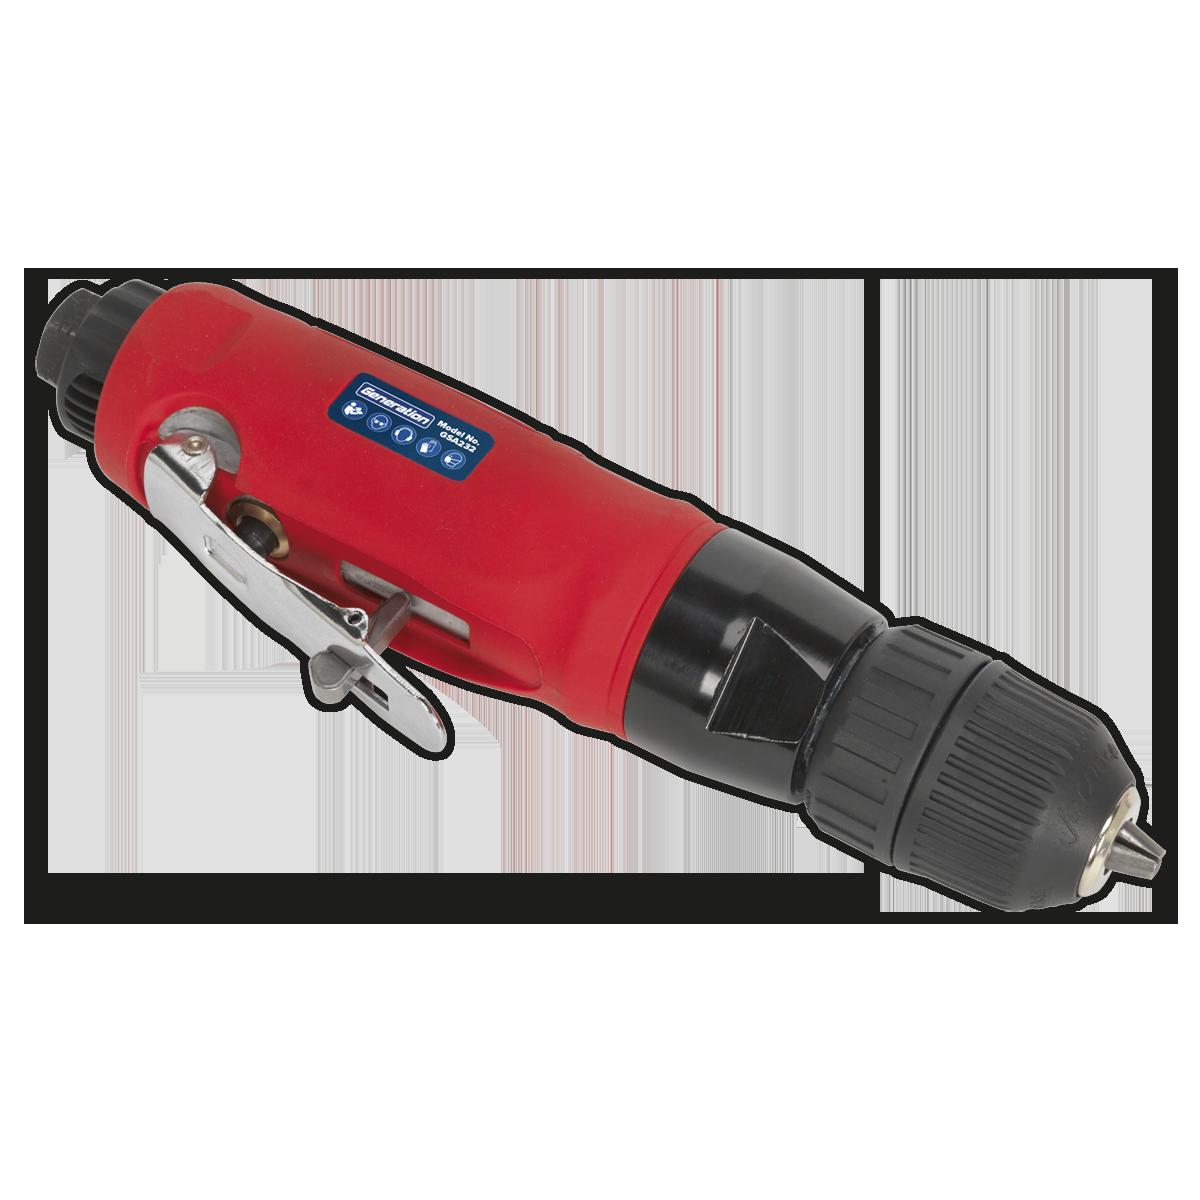 Air Drill Straight with Ø10mm Keyless Chuck